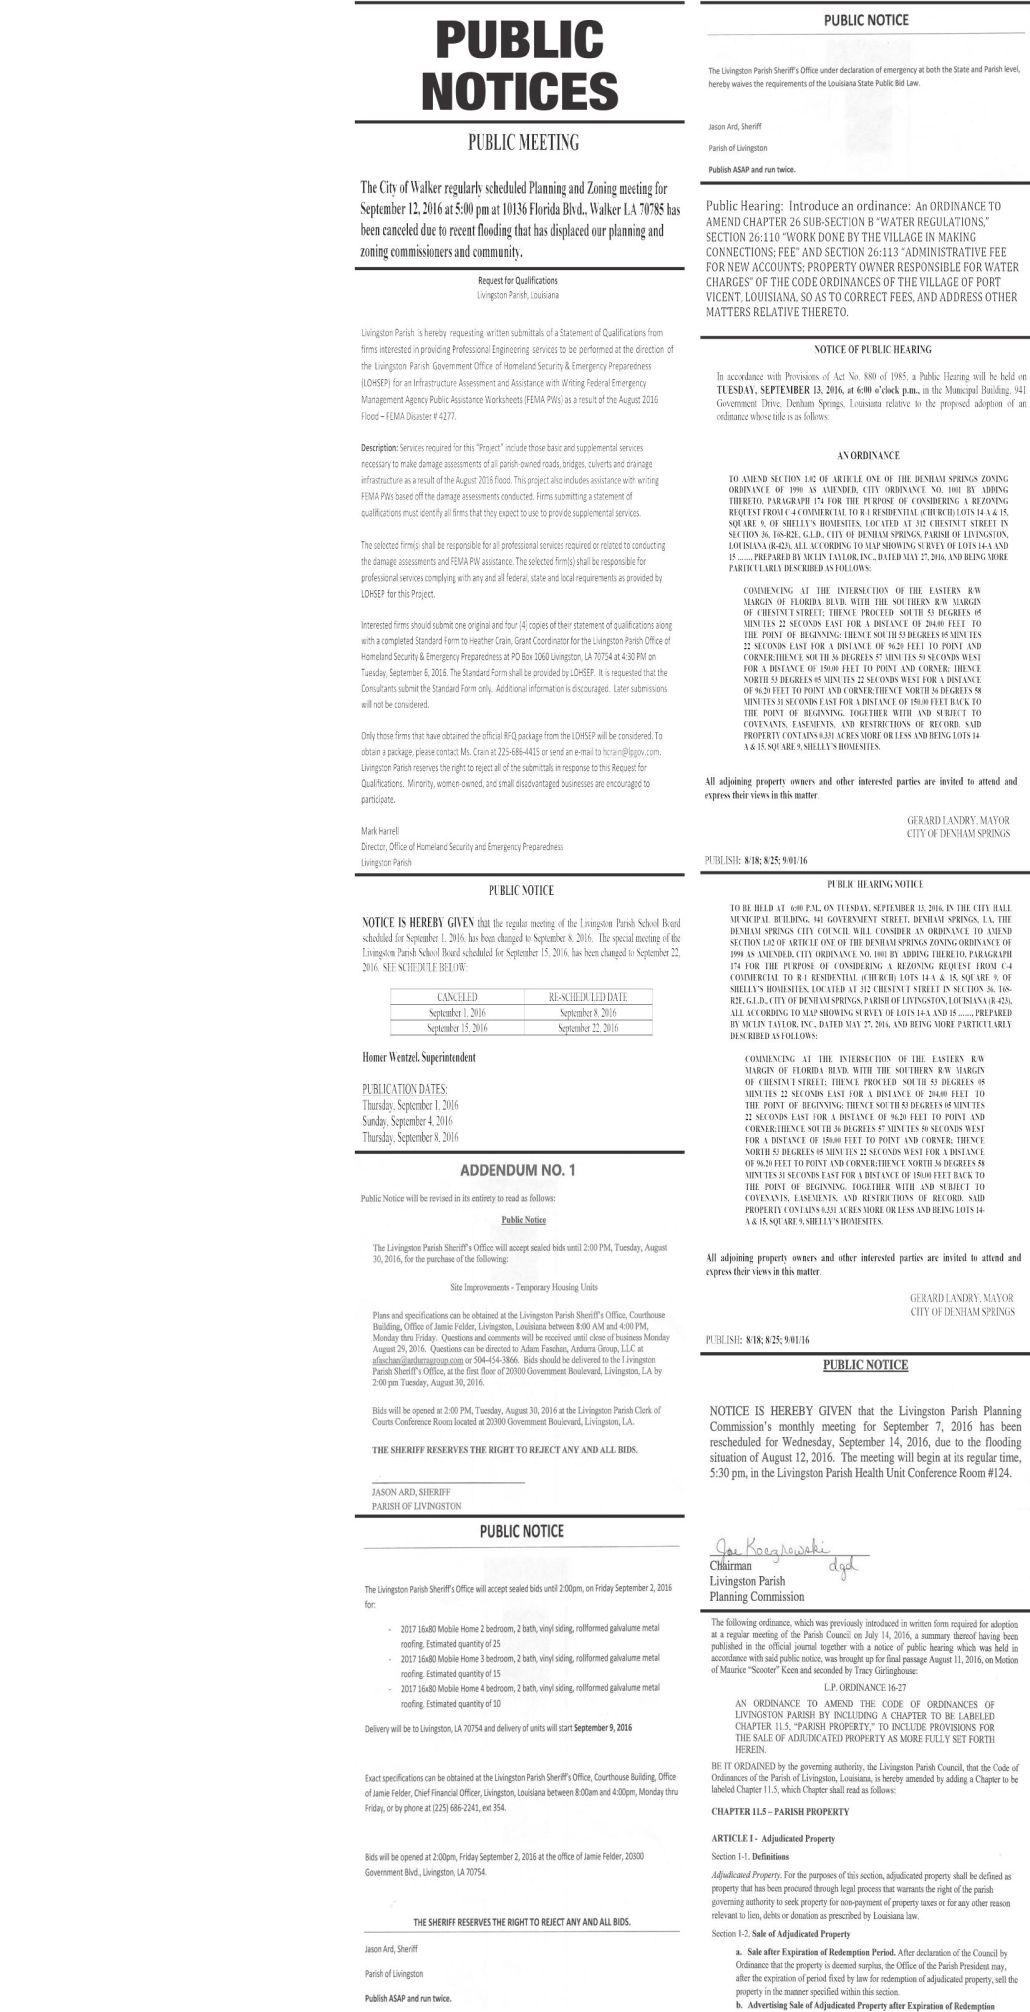 Public Notices published September 1, 2016